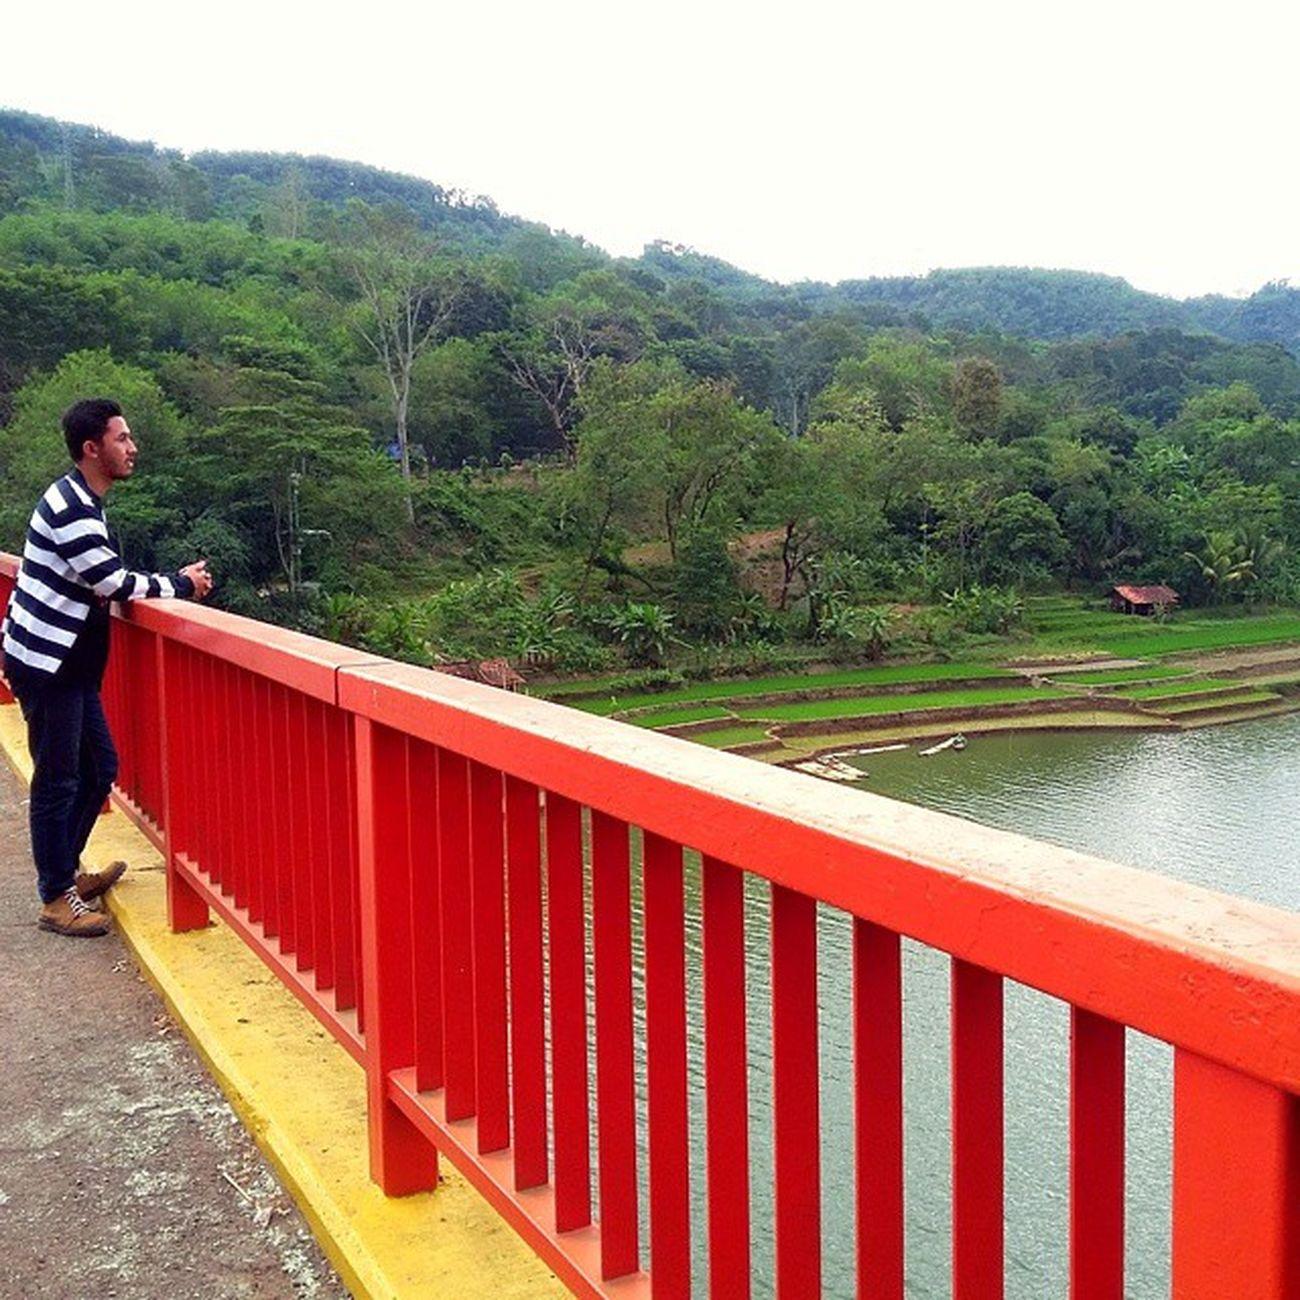 "Bukan lagi syuting ""Si Manis Jembatan Ancol"" kok ini.. Ridwanderful TravelingPakeReceh JarambahBandung DiBawahLangitBandung BandungIsMe"